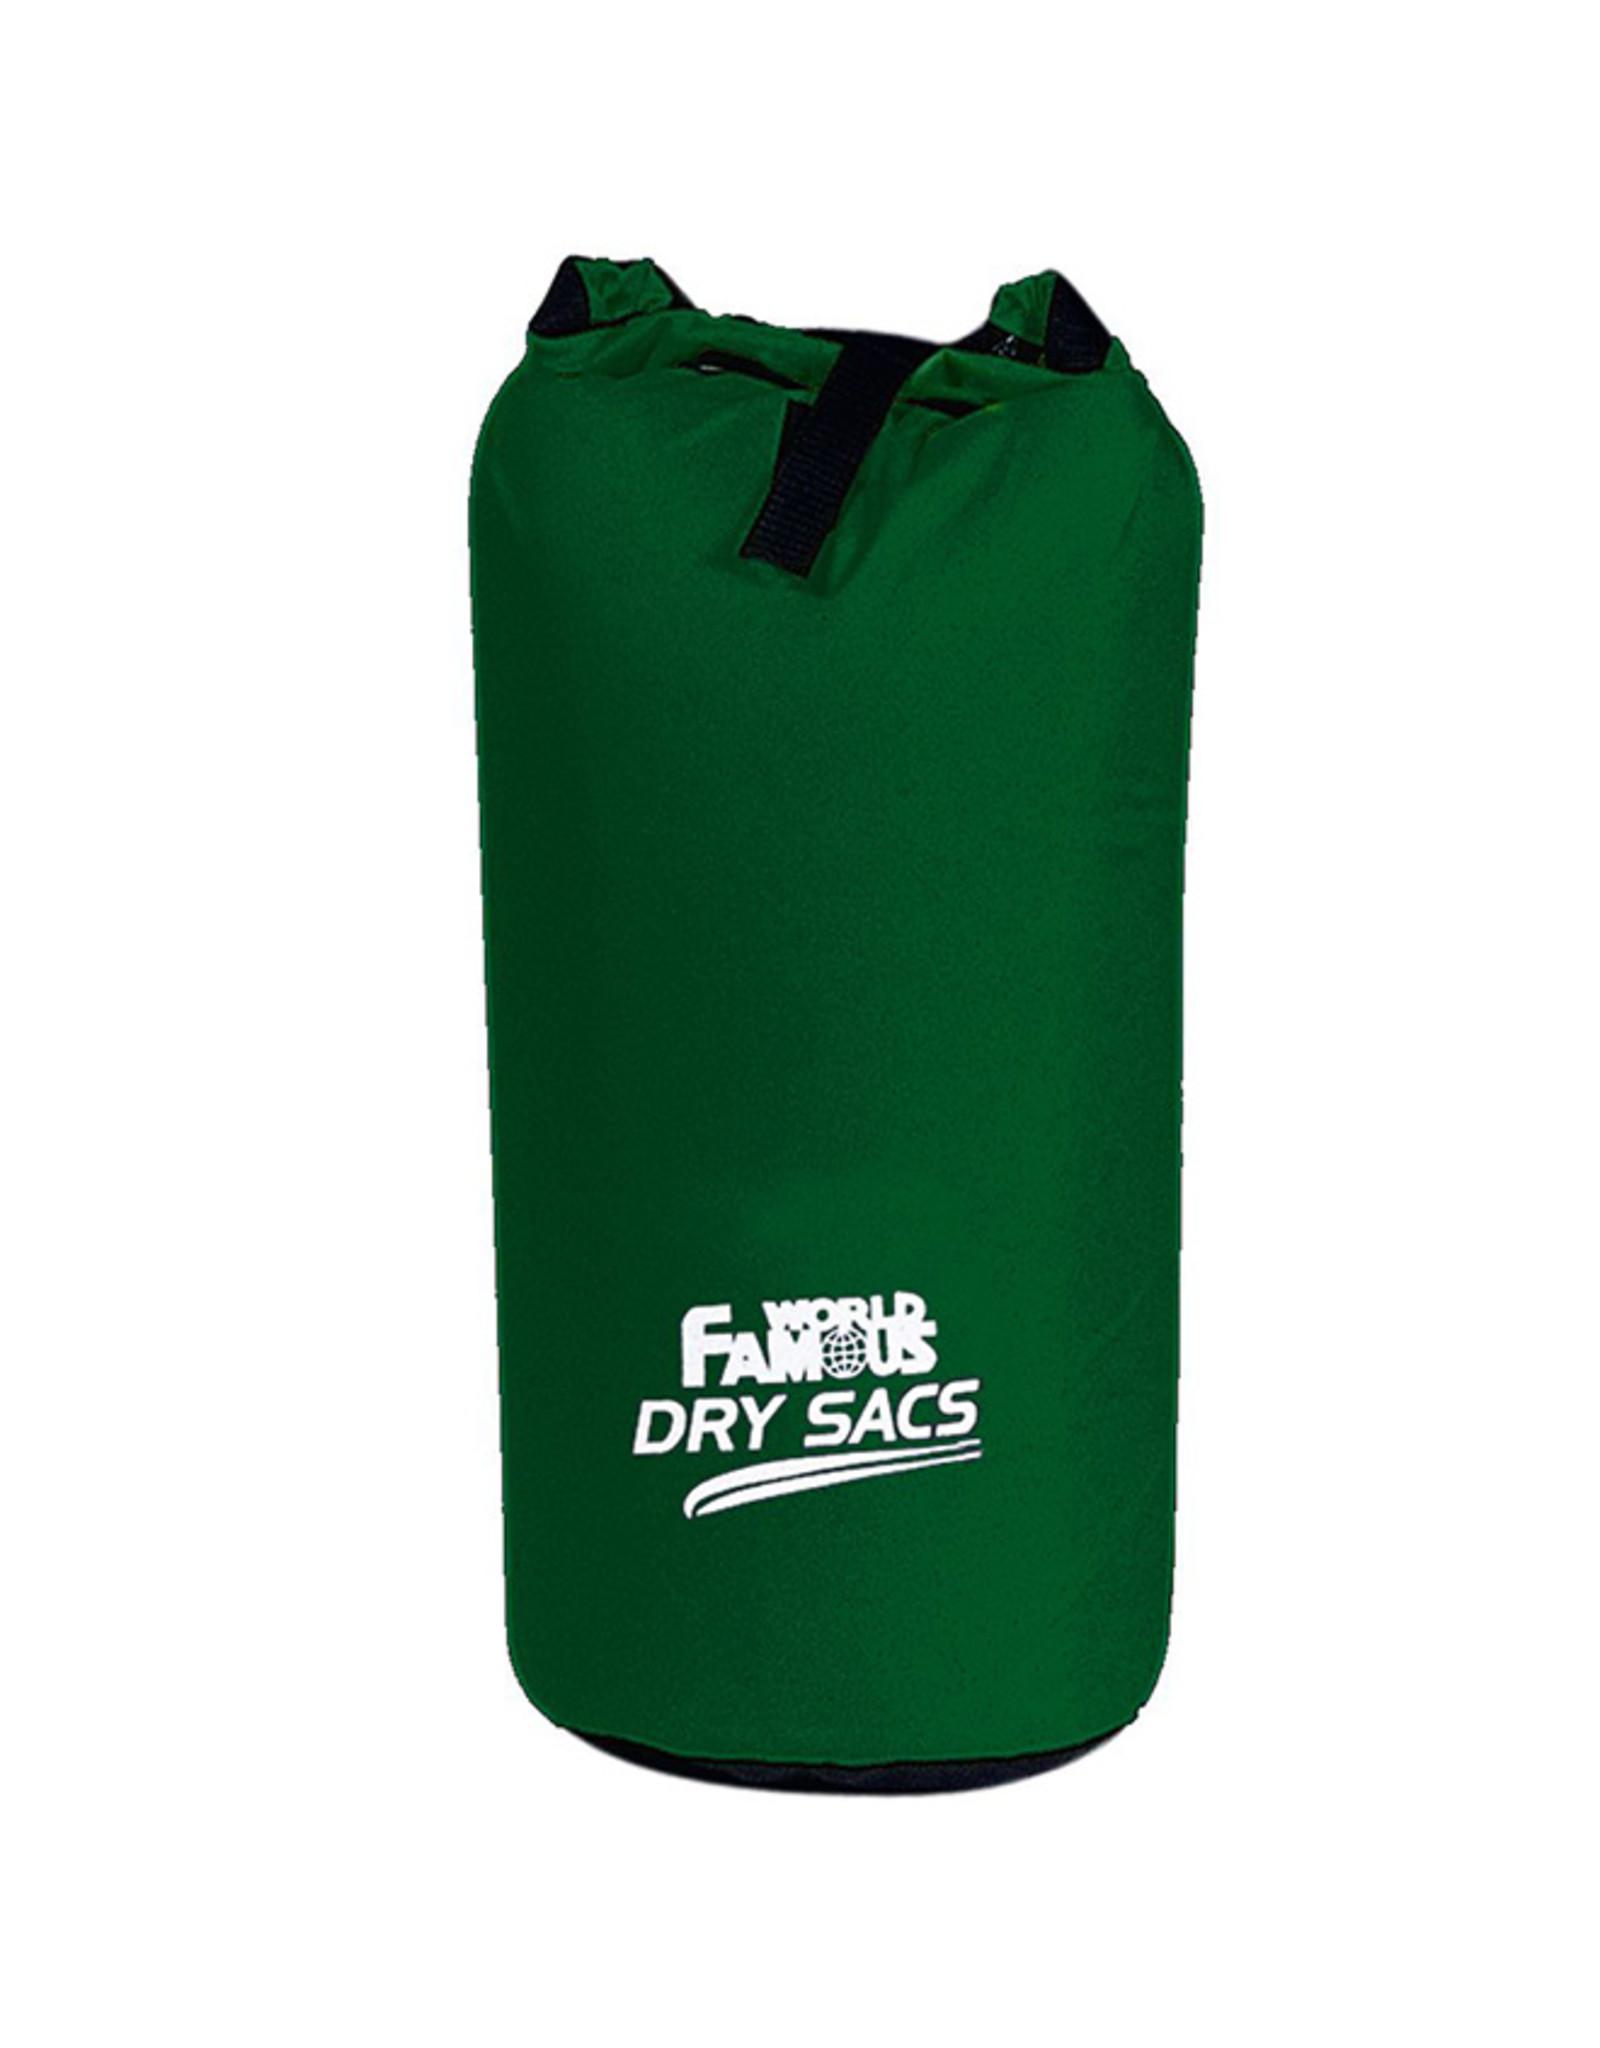 WORLD FAMOUS SALES WF 1228 DRY SACK